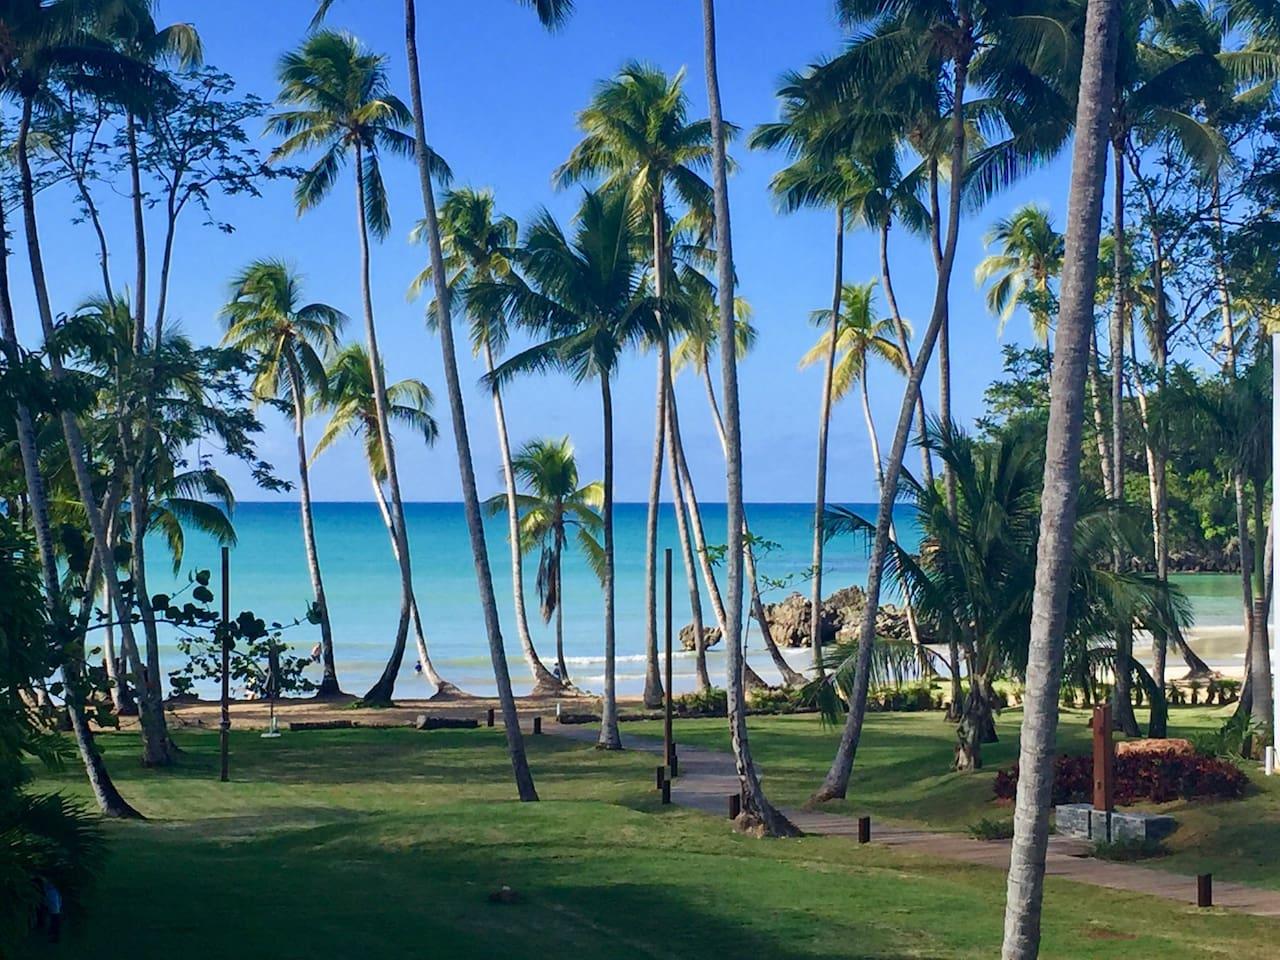 100 steps to Playa Bonita Beach. Enjoy fresh coconut juice and seaside food service from local beach restaurants